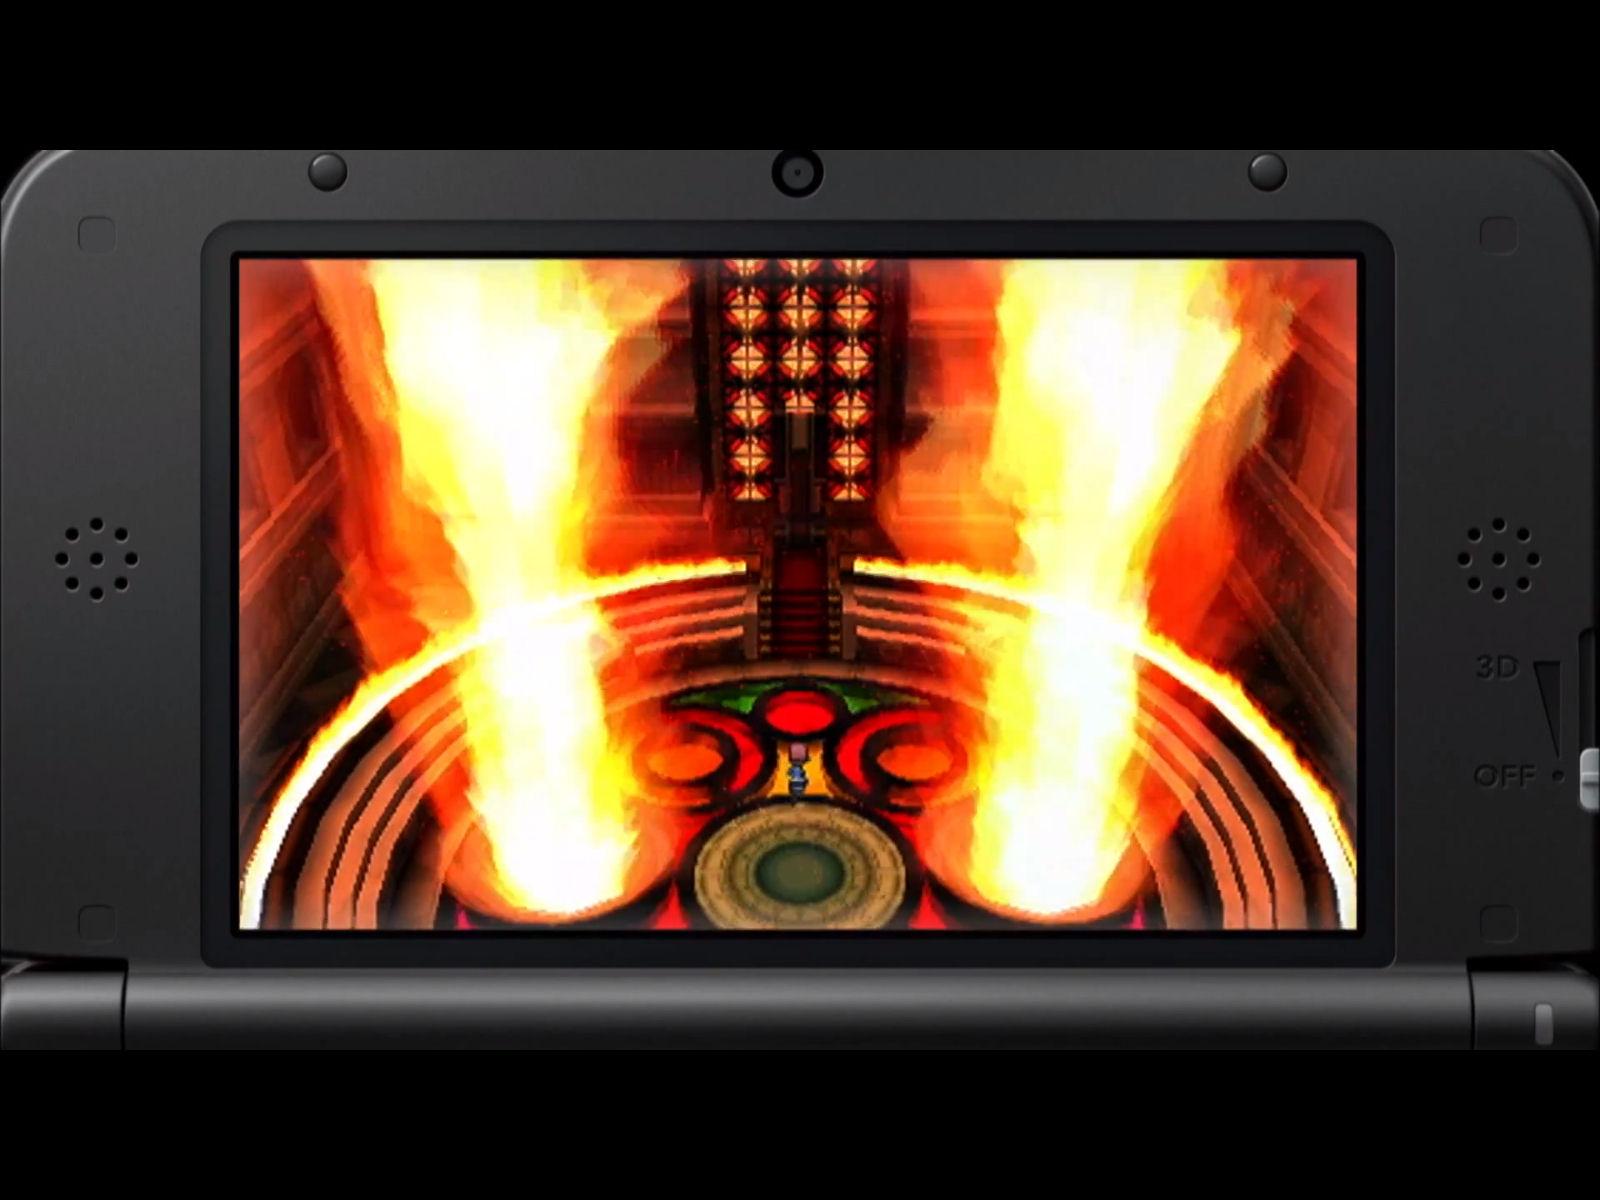 Pokemon X and Y Fire Gym Screenshot